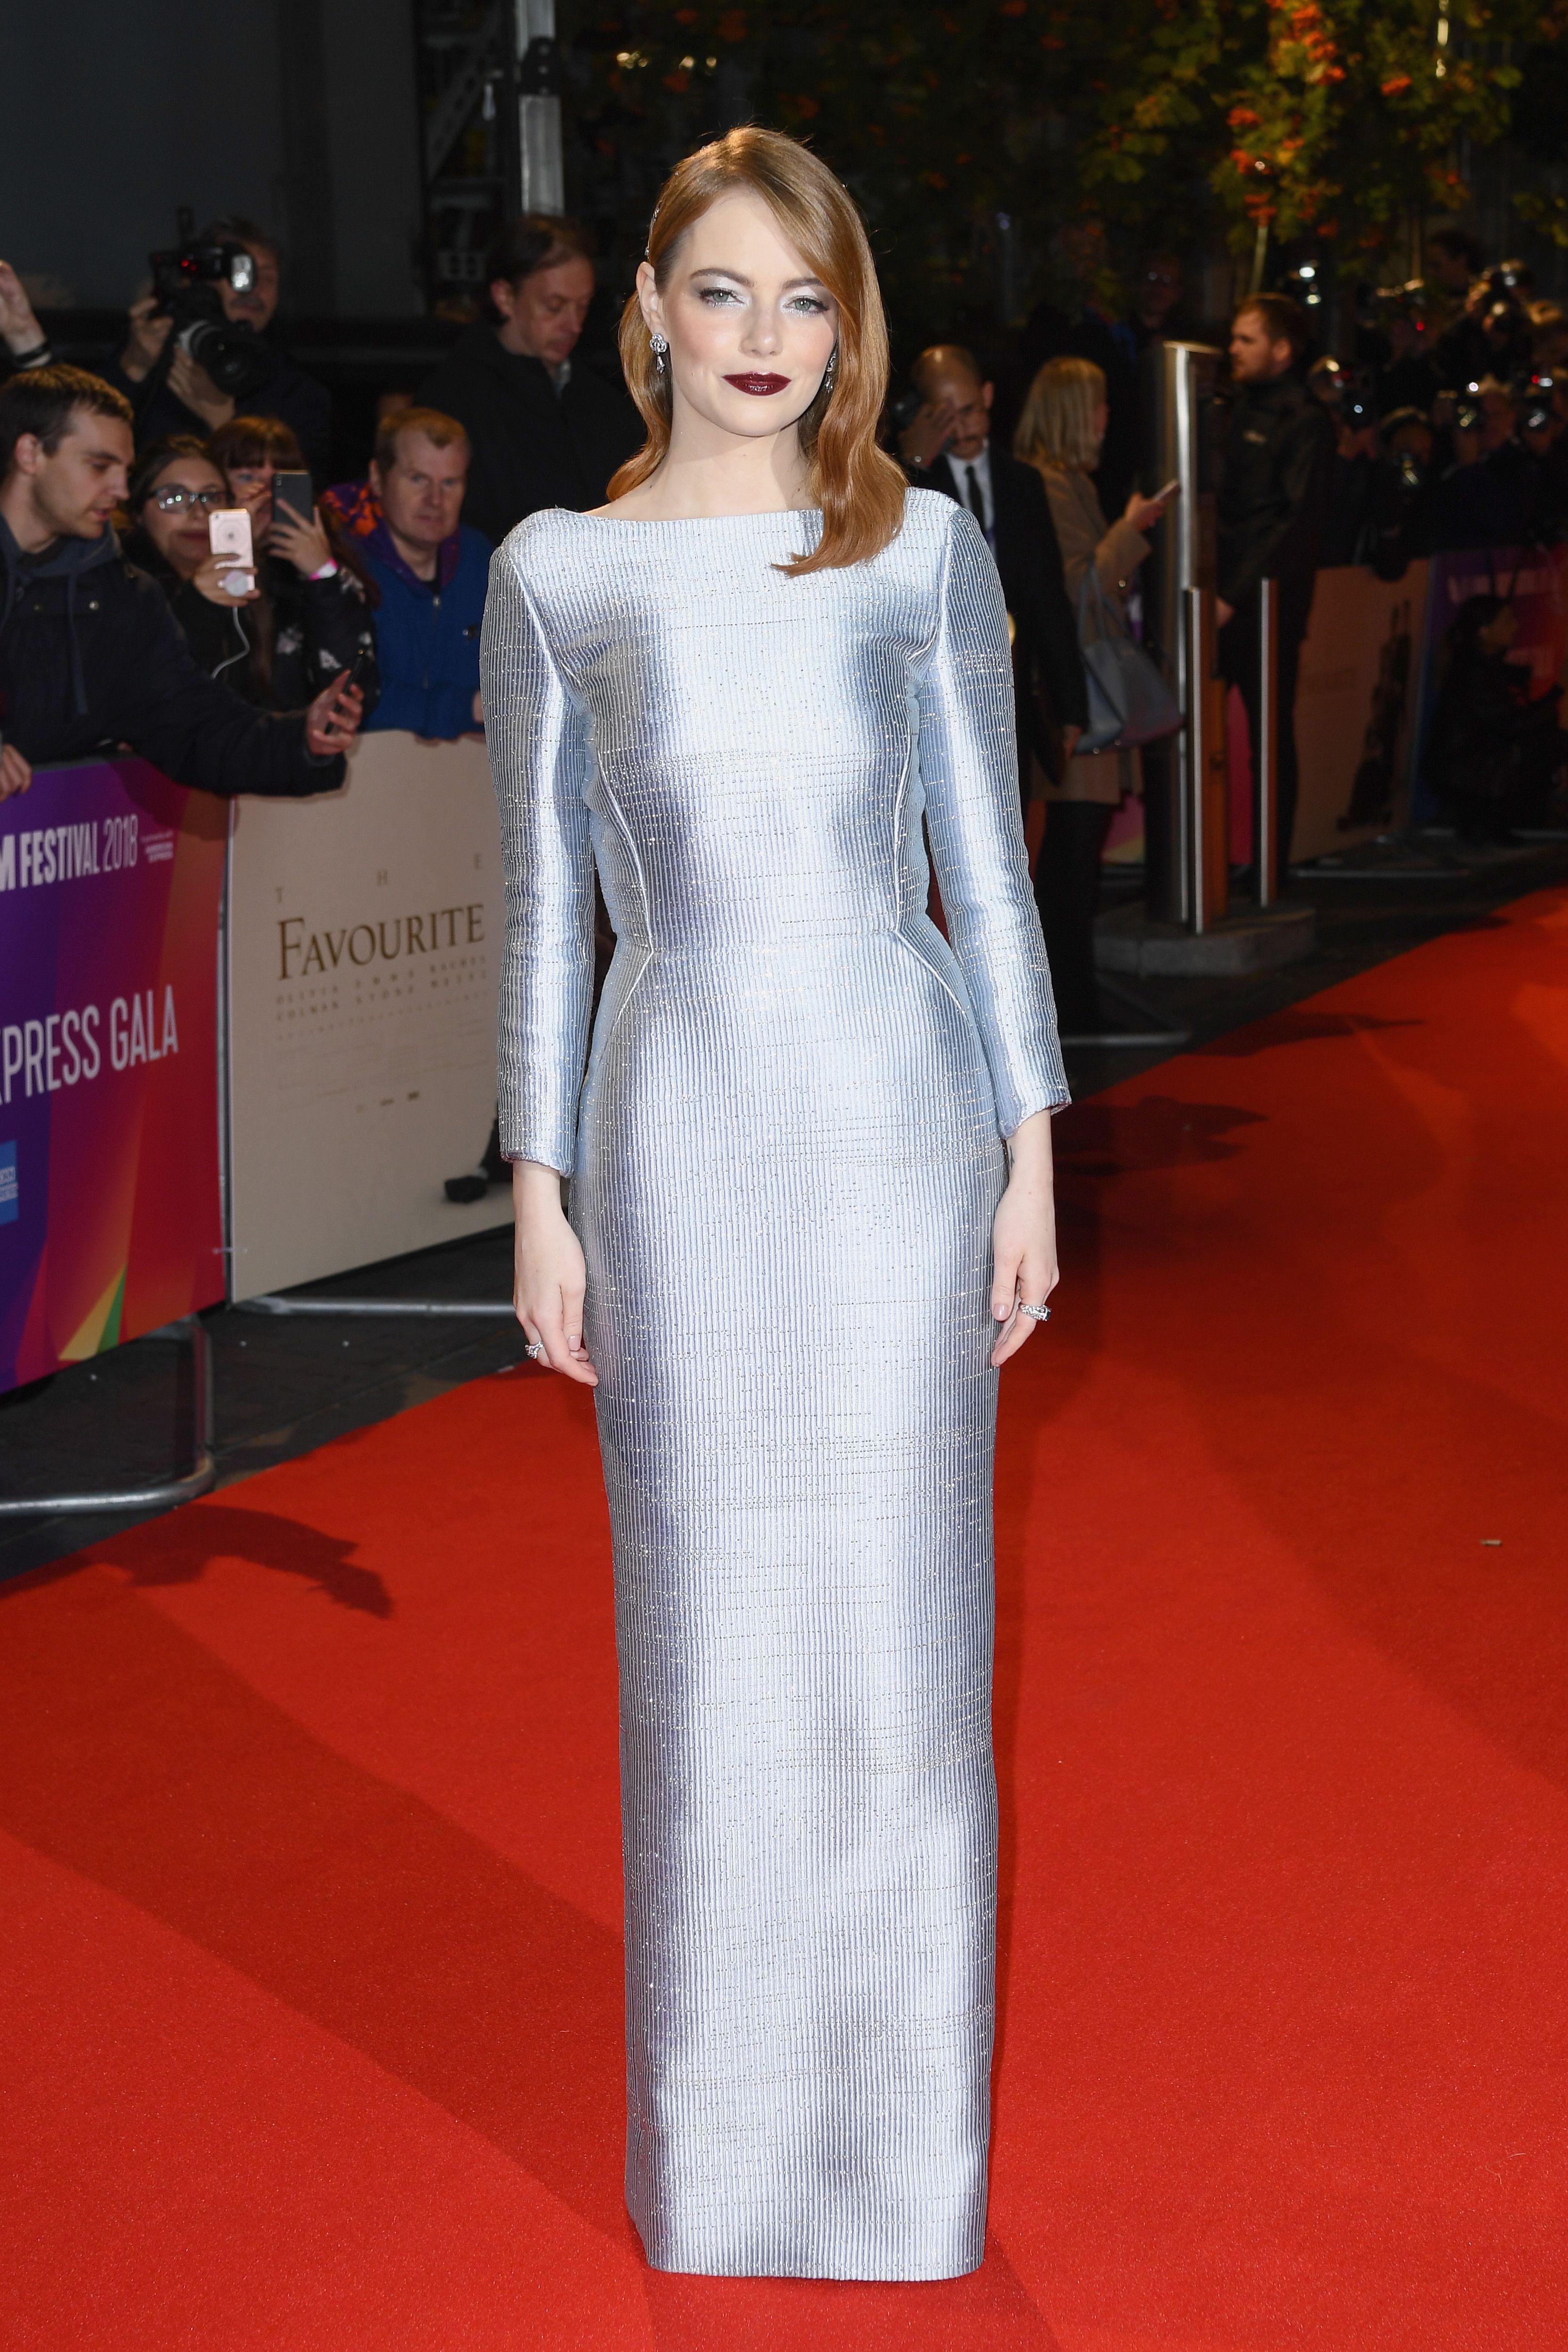 Emma Stone In Louis Vuitton –  The Favourite  London Film Festival Premiere 376218fb23